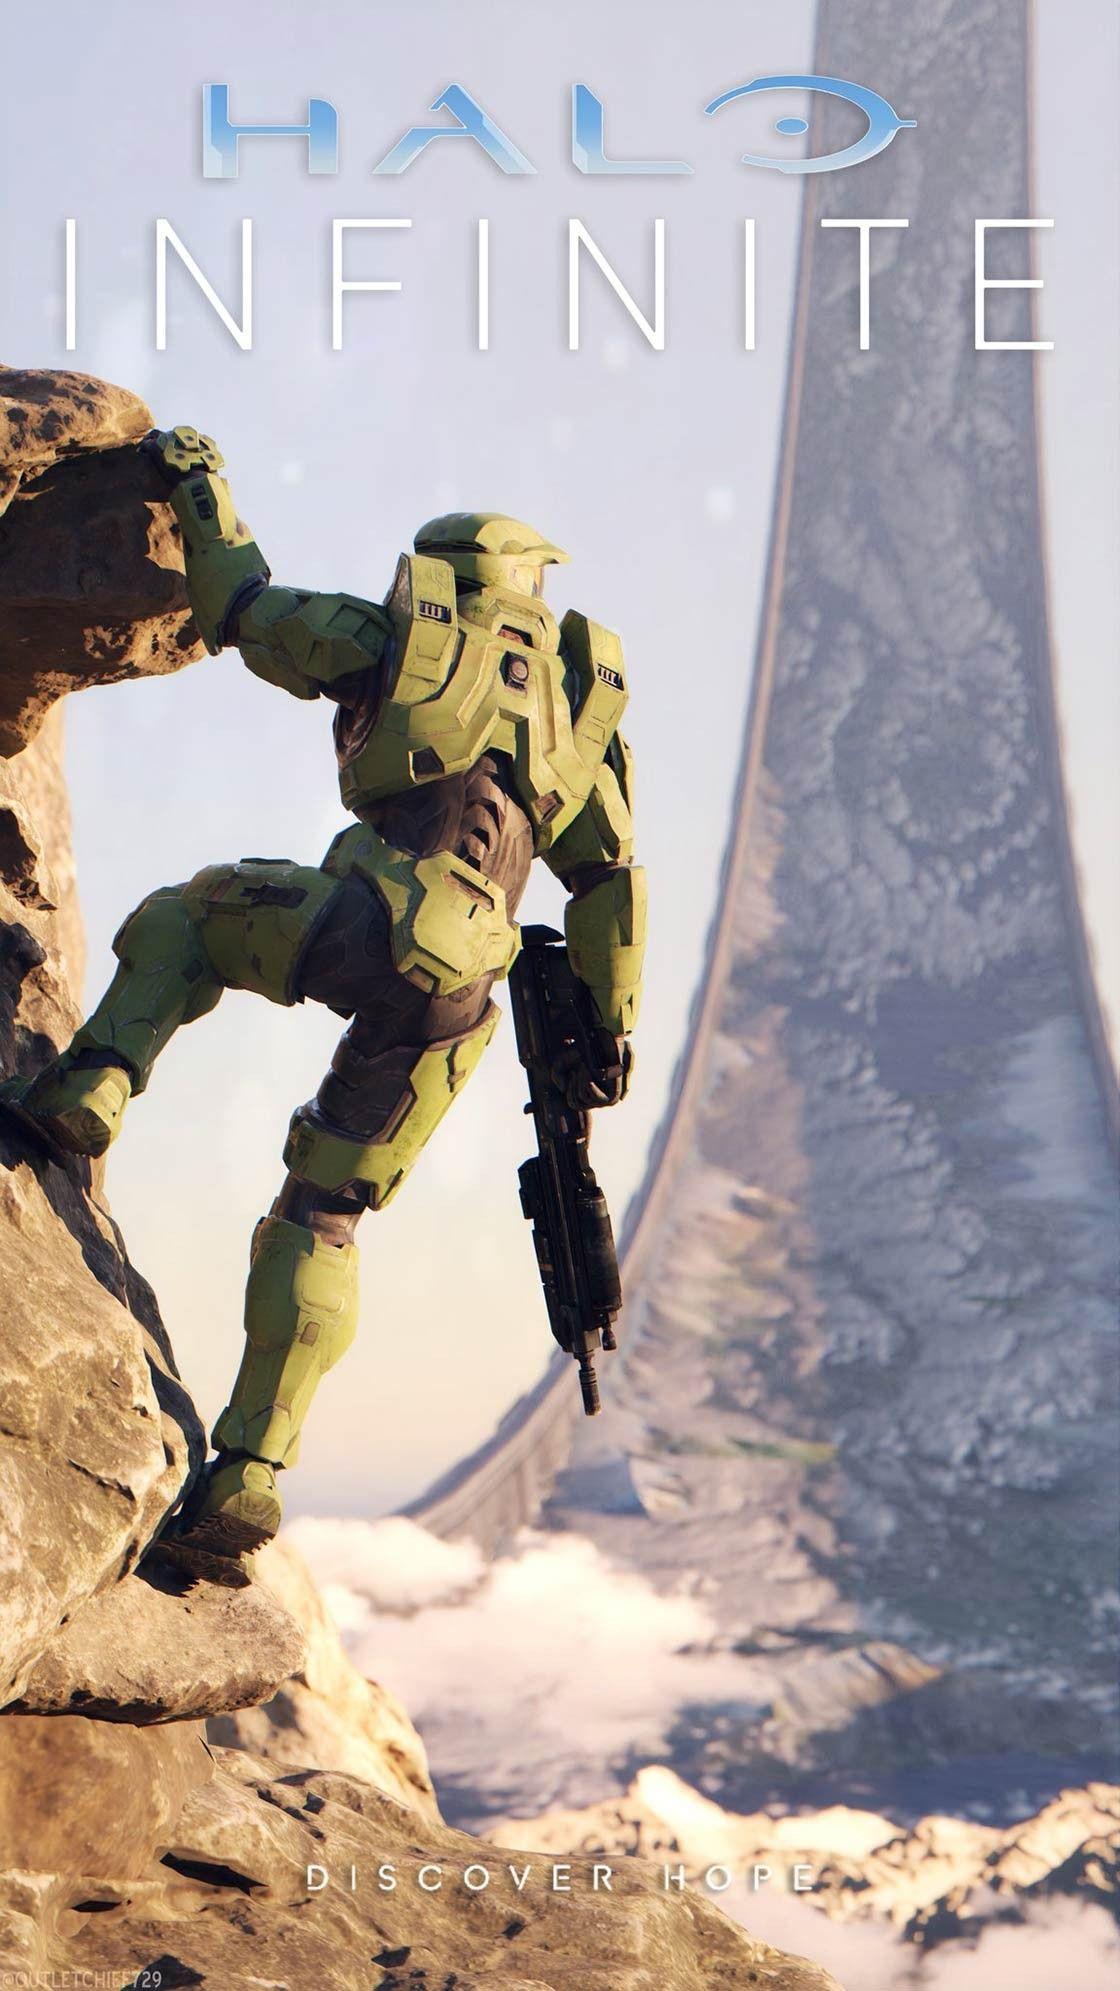 Halo Infinite Wallpaper In 2021 Halo Funny Halo Halo Spartan Armor